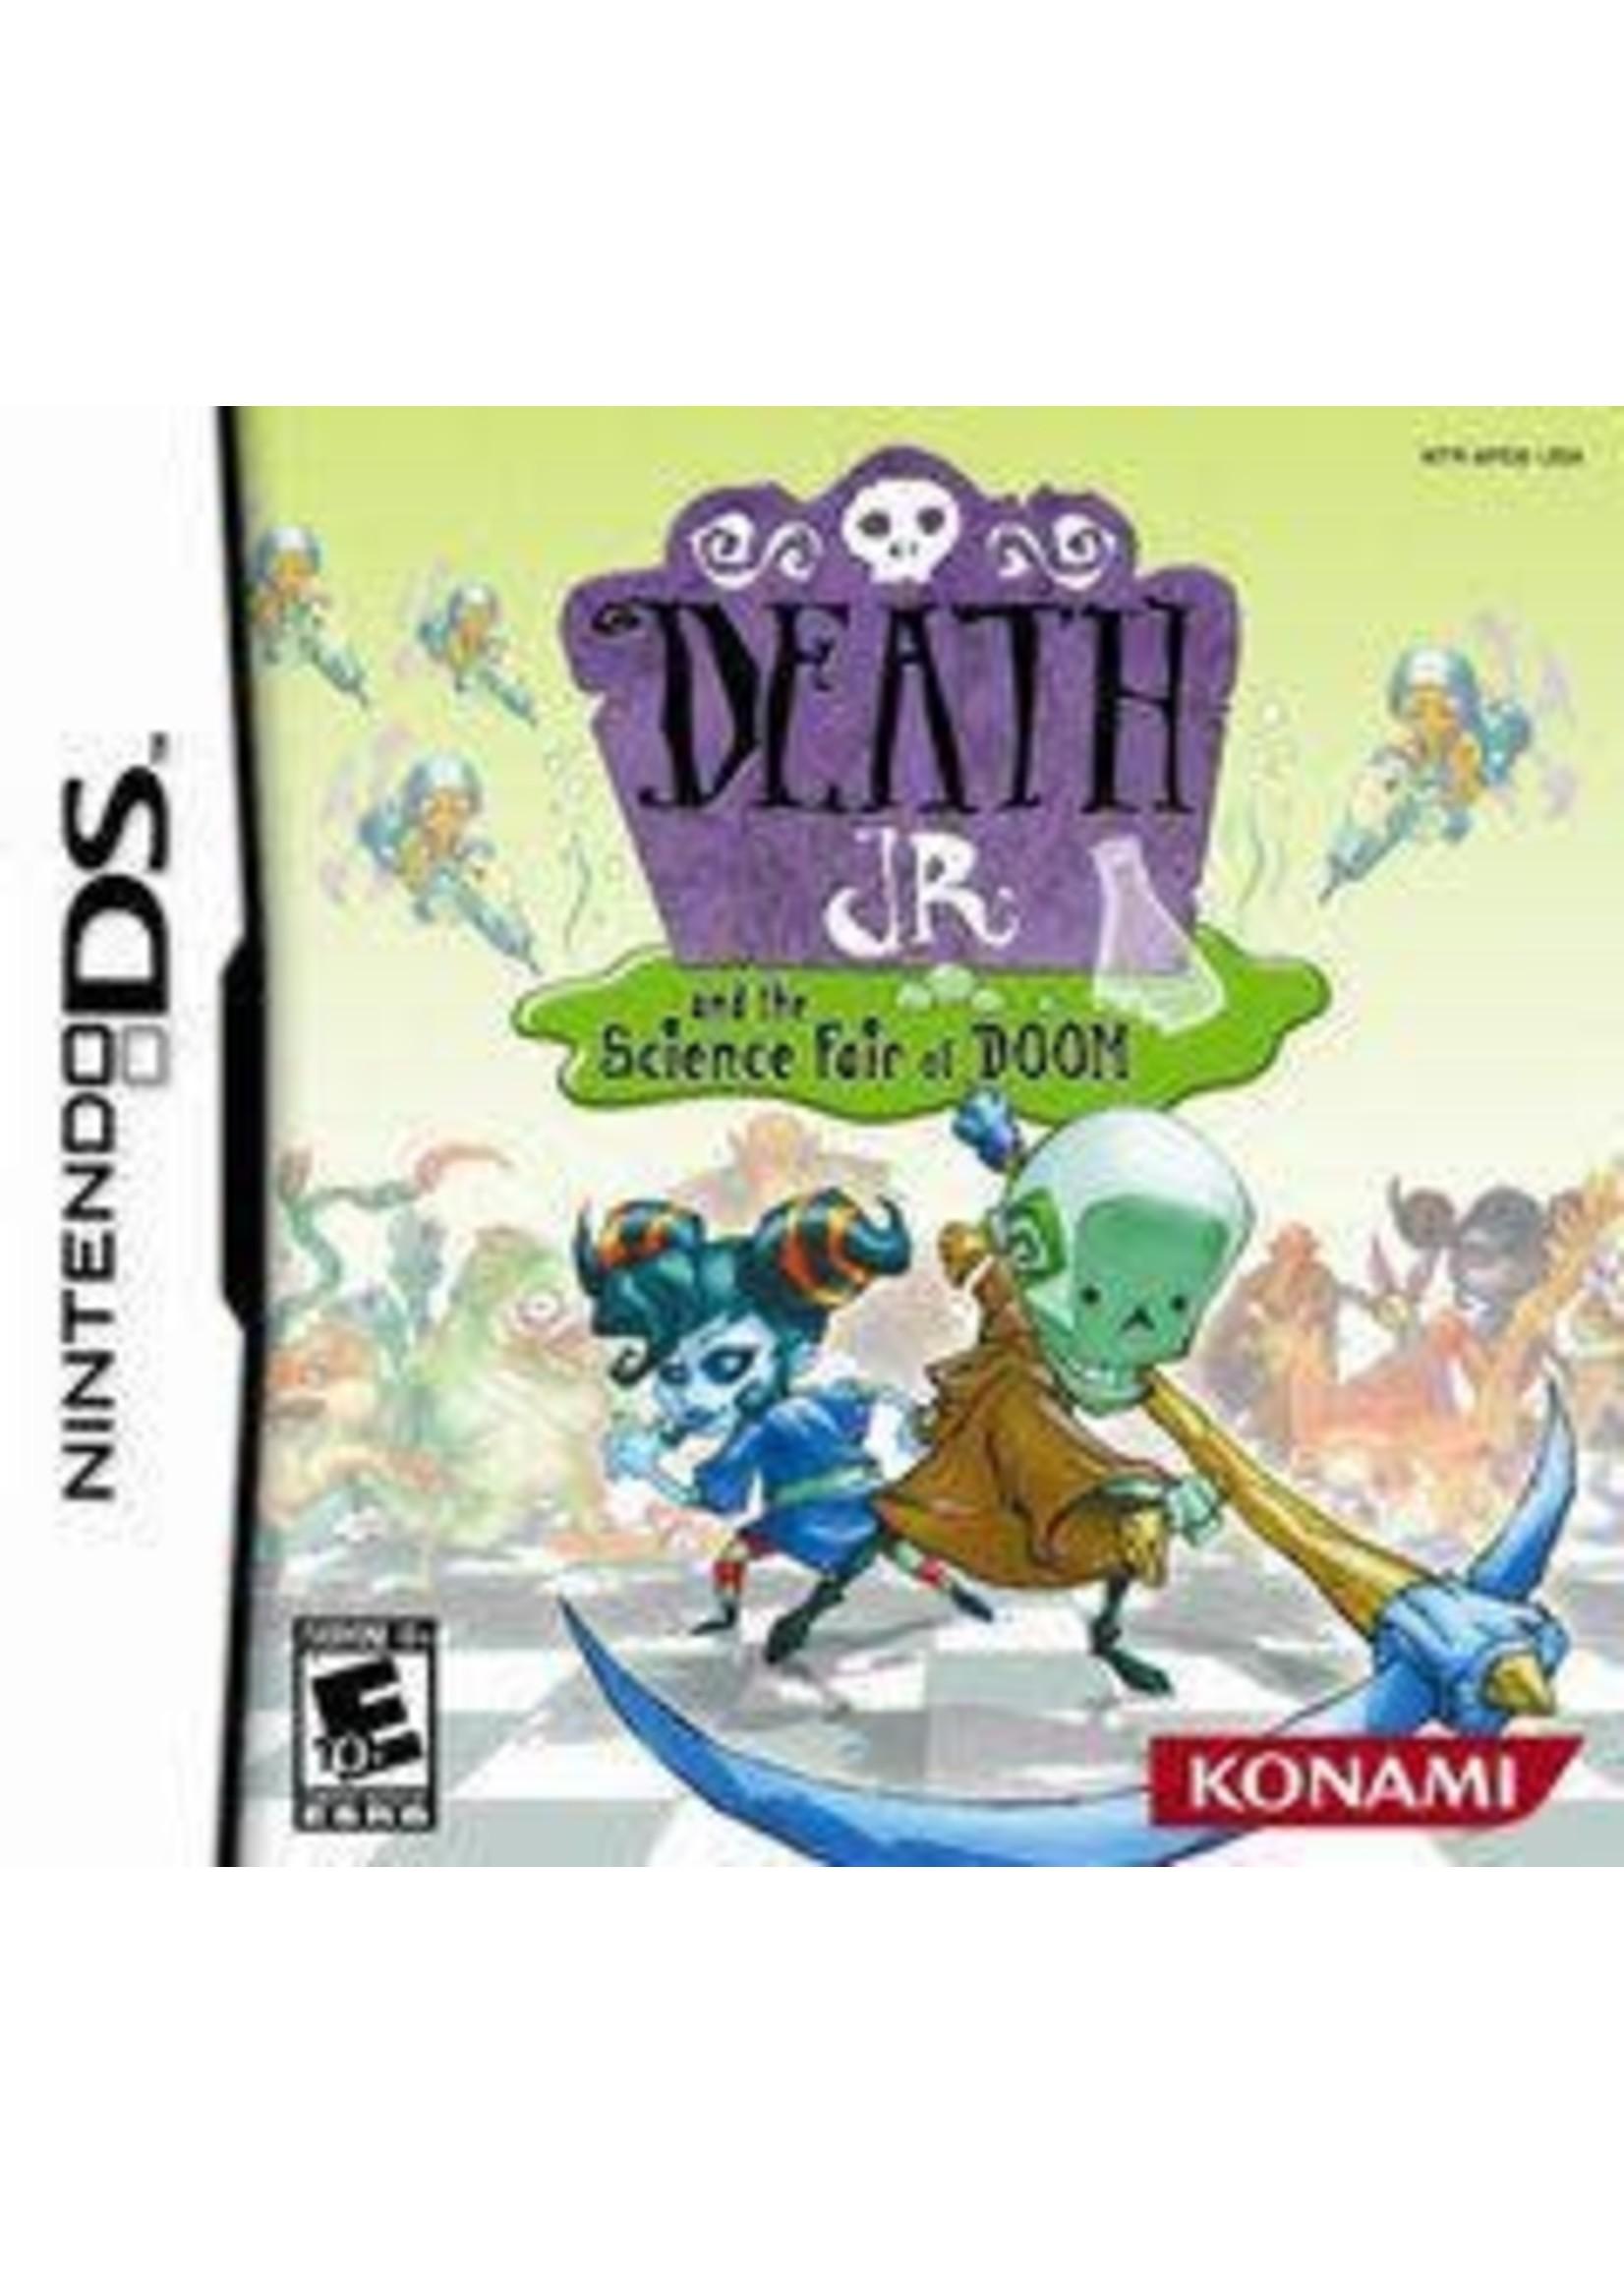 Death Jr & The Science Fair Of Doom Nintendo DS